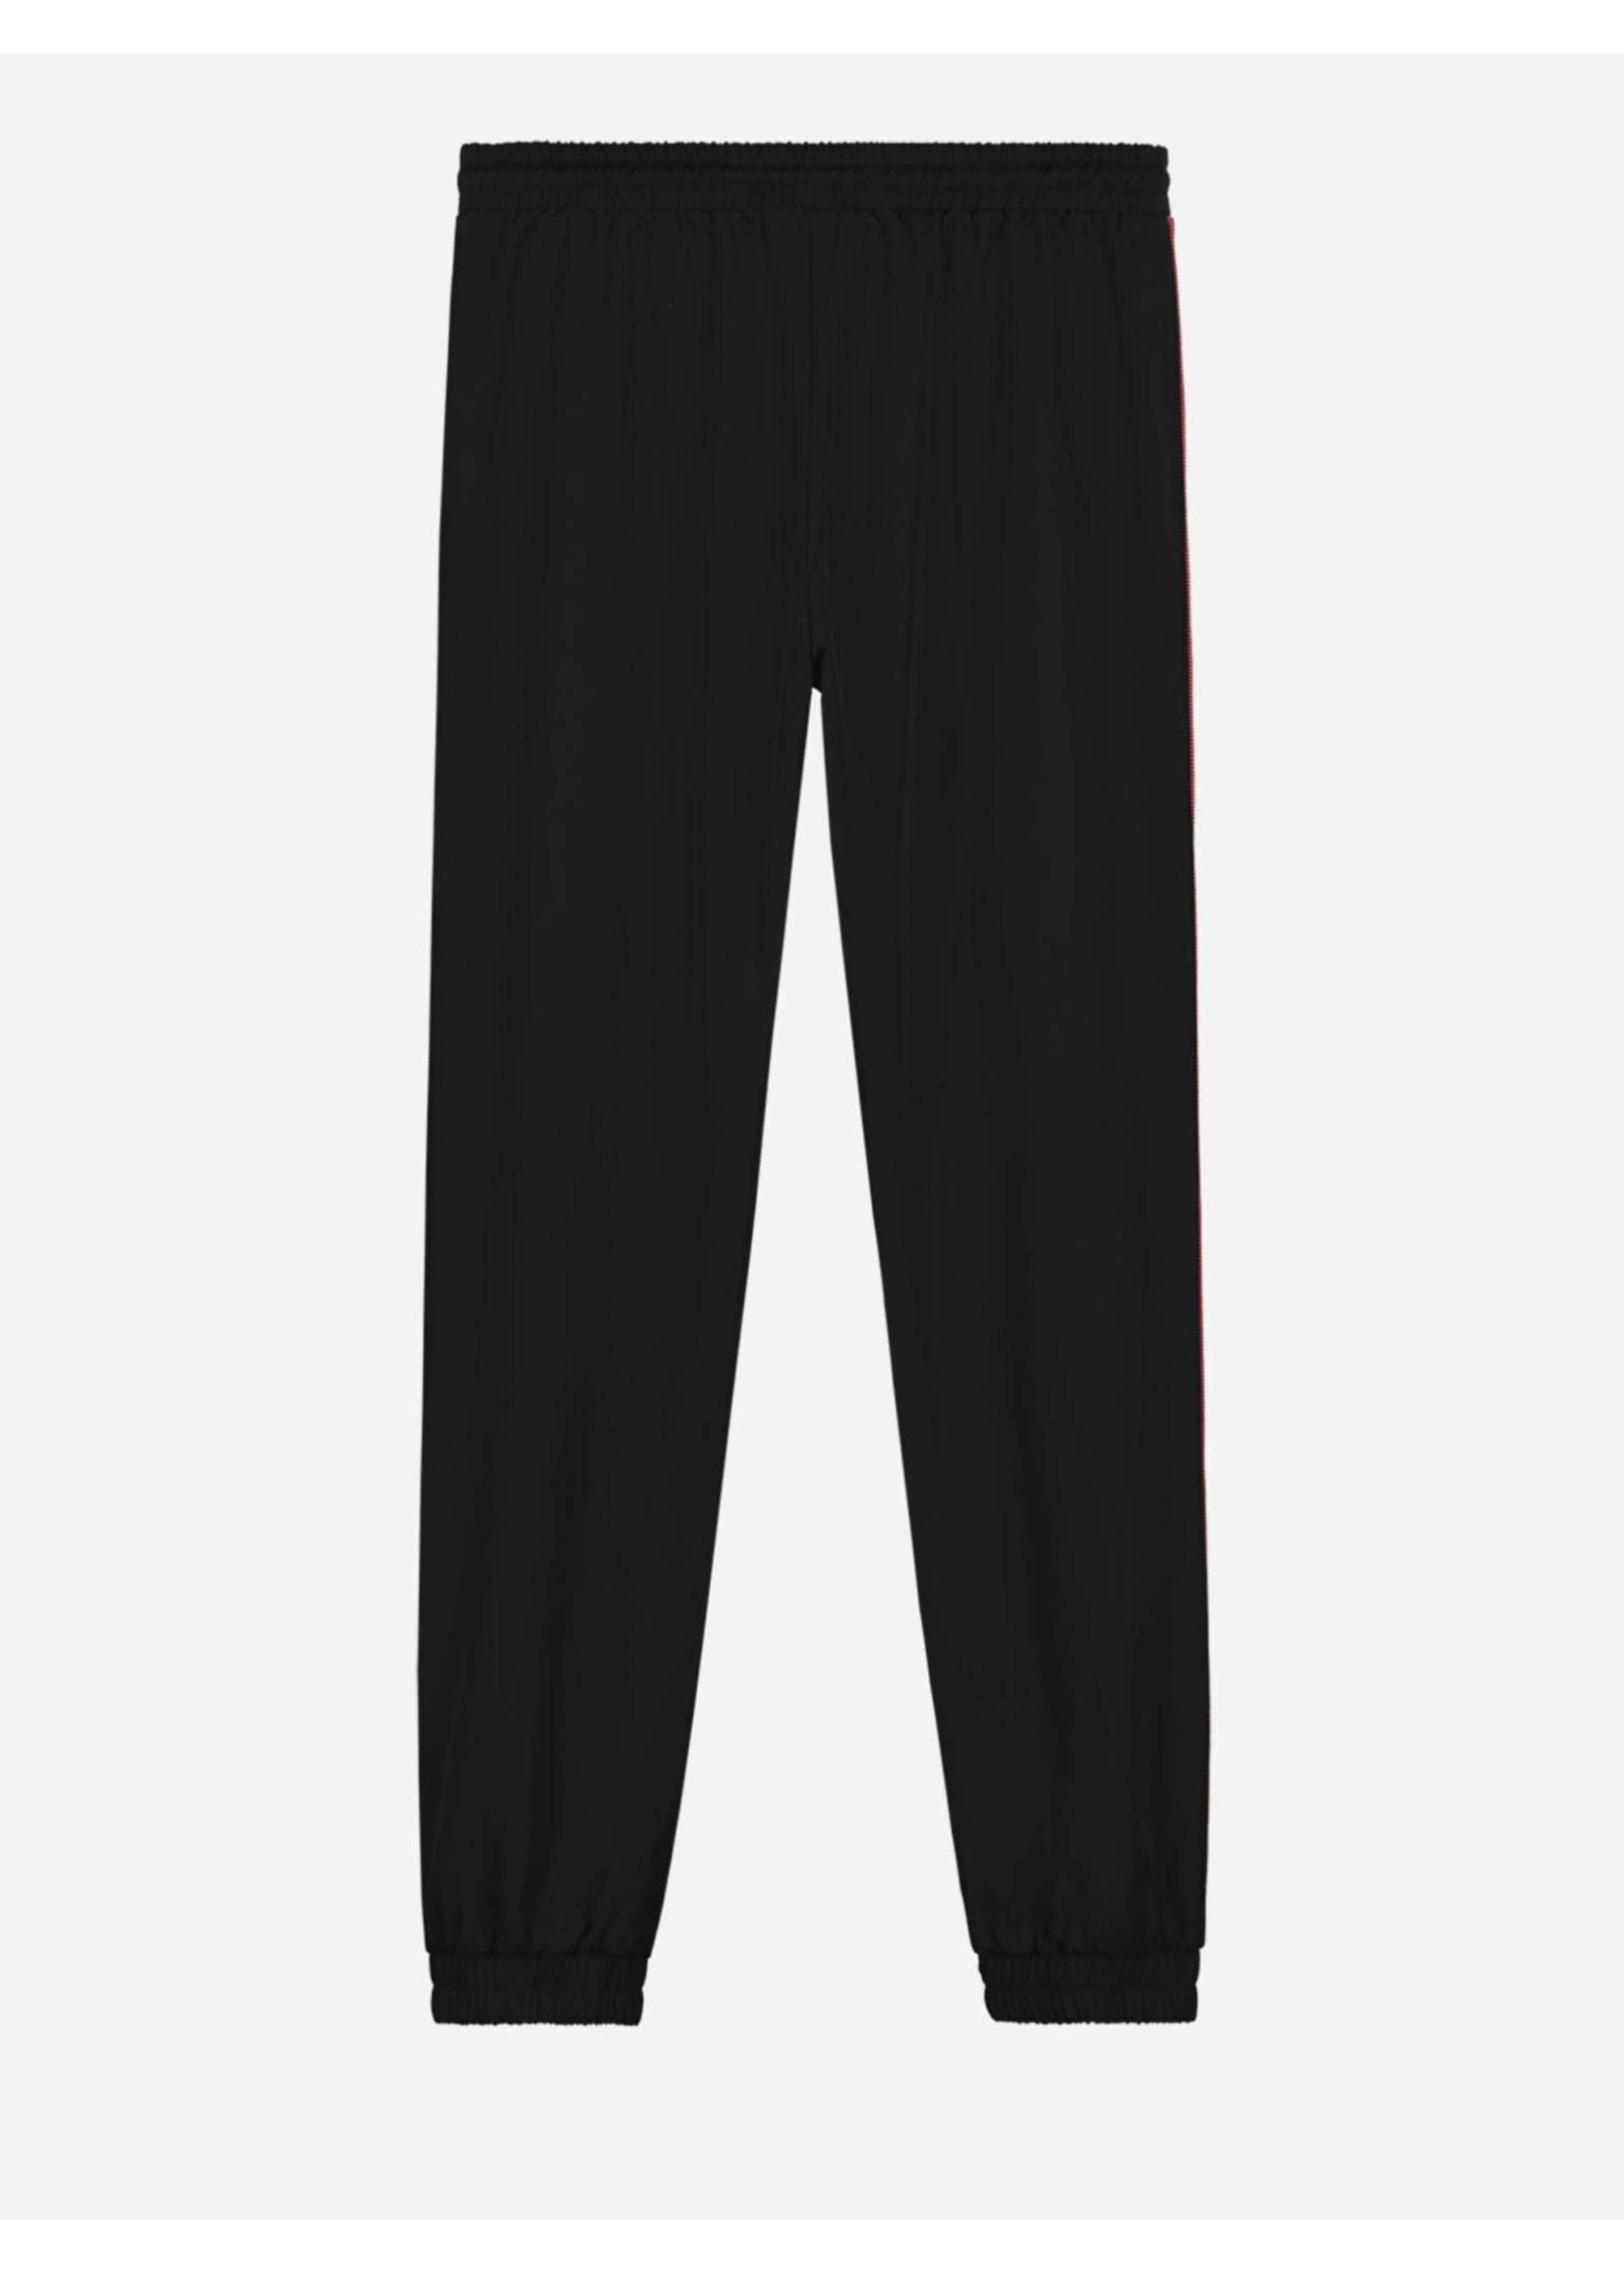 NIK&NIK Nik&Nik Marnix Woven Pants - Black